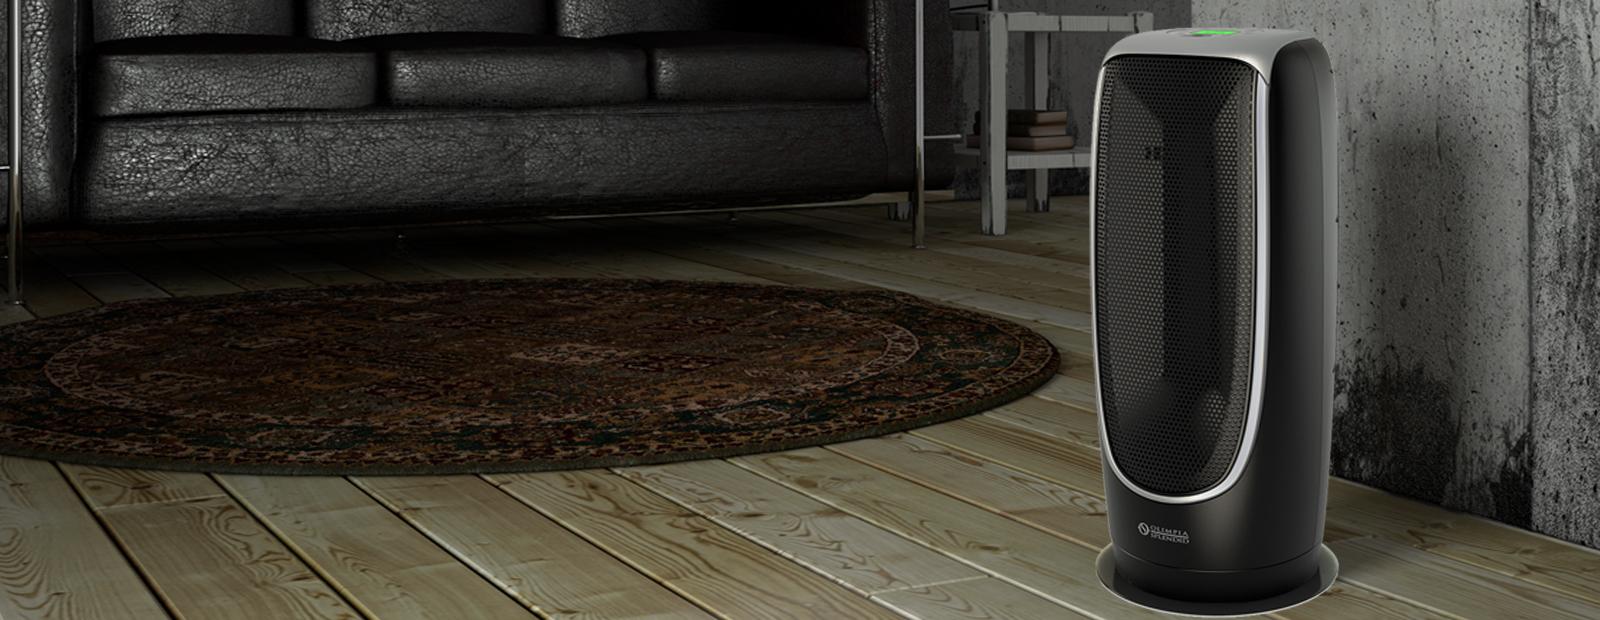 radical torre metal olimpia splendid. Black Bedroom Furniture Sets. Home Design Ideas